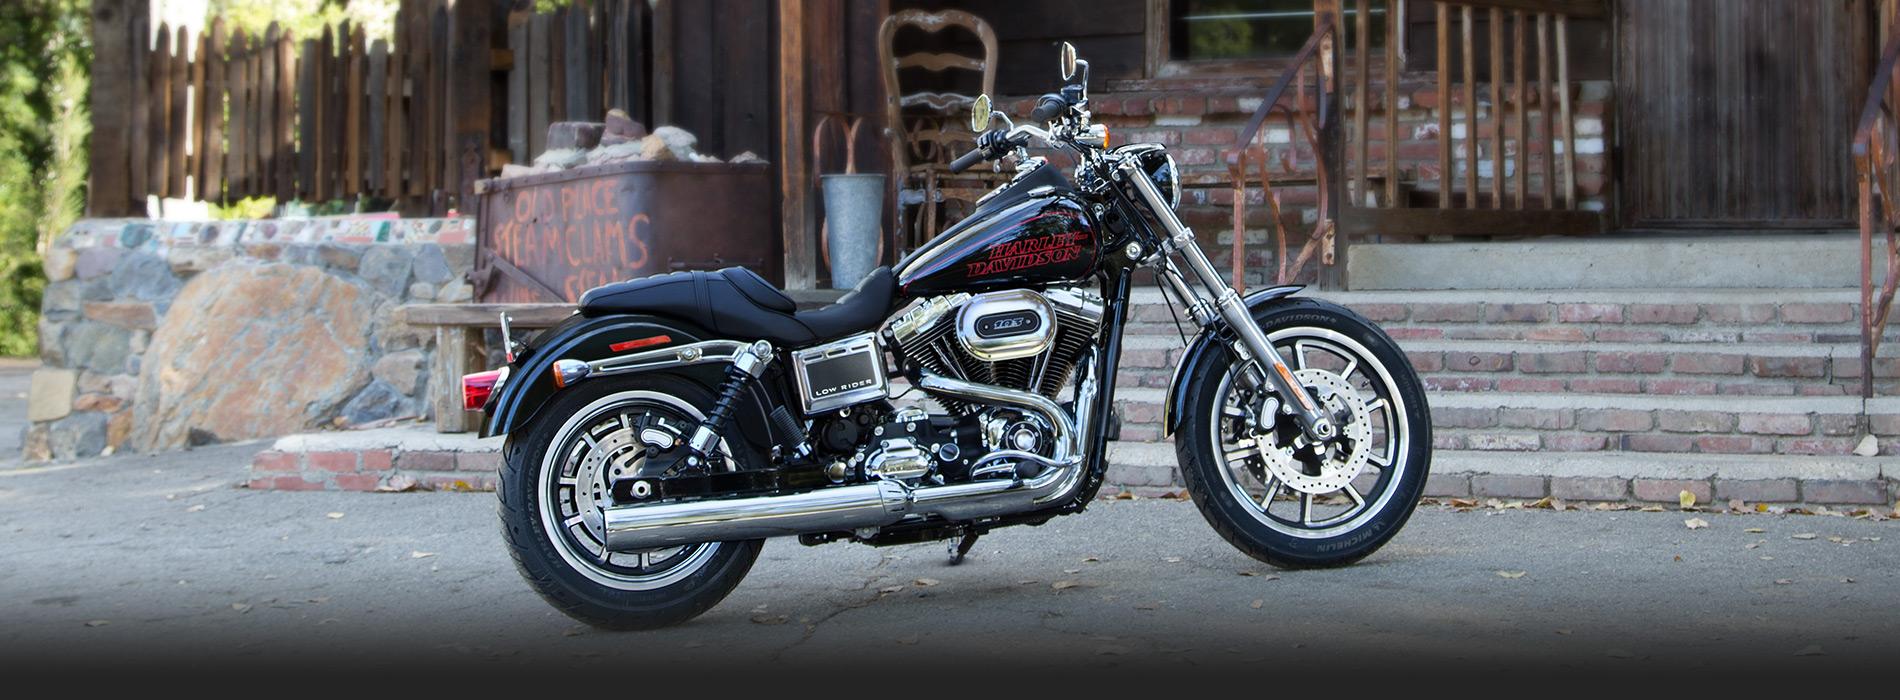 Harley-Davidson Low Rider Wallpapers, Vehicles, HQ Harley